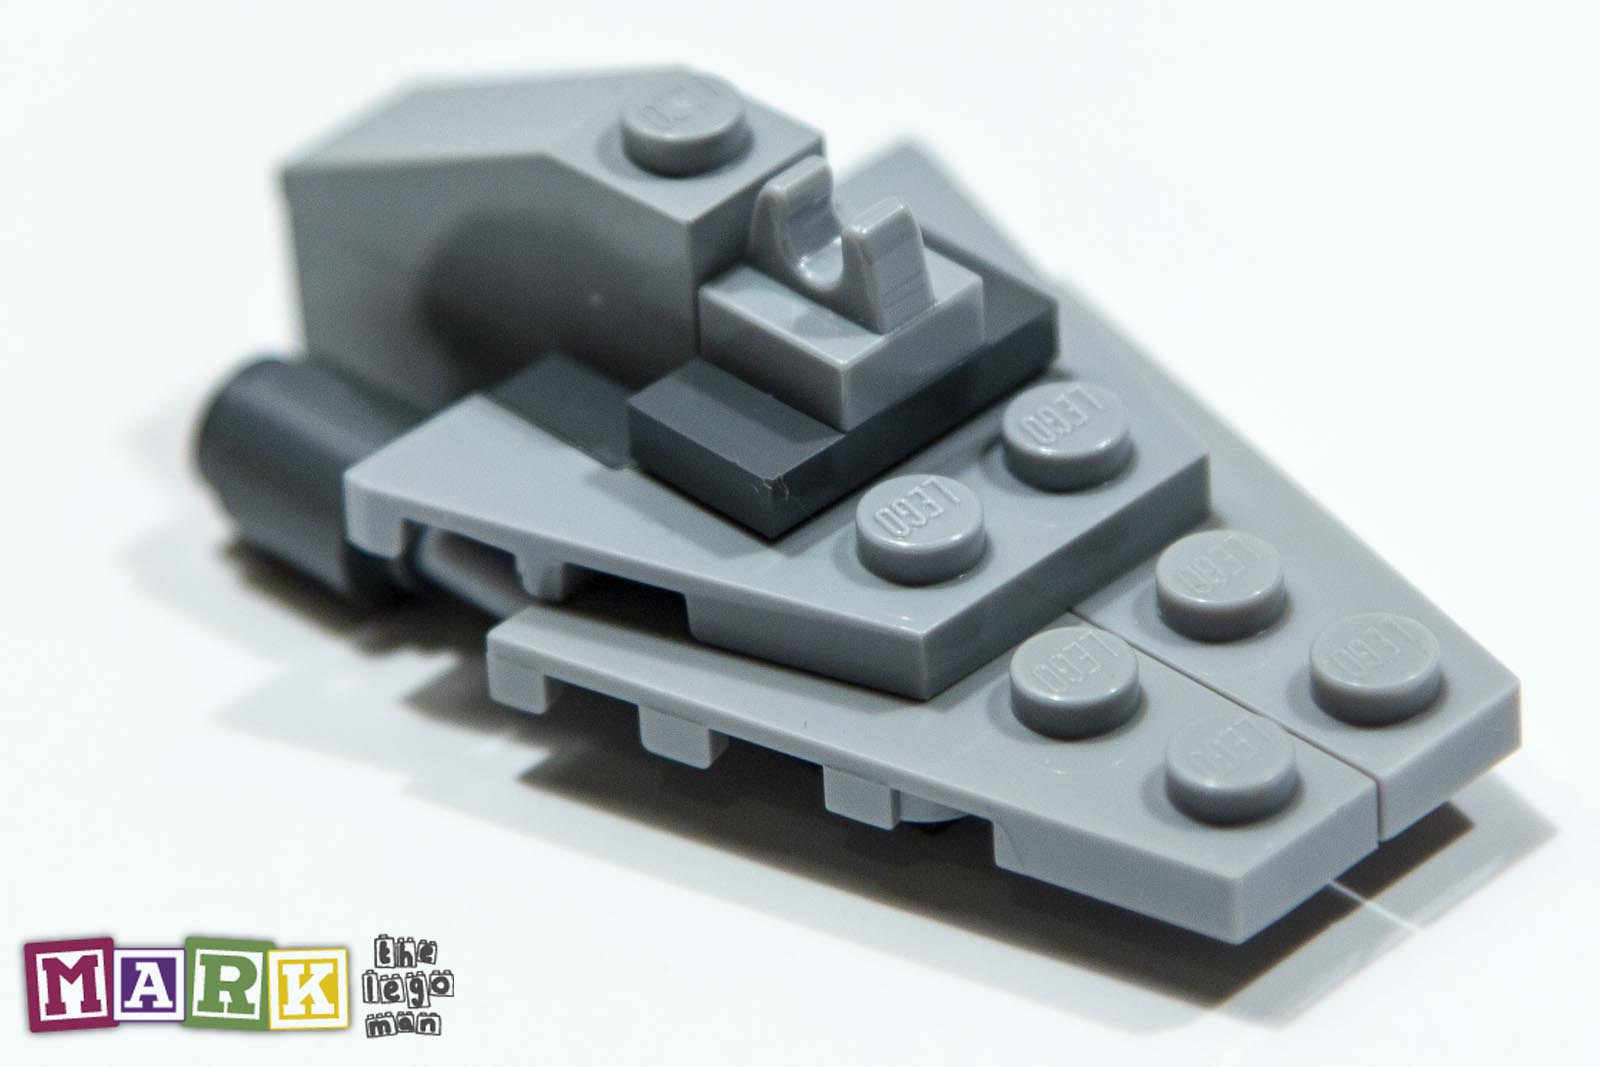 lego star wars republic assault ship instructions